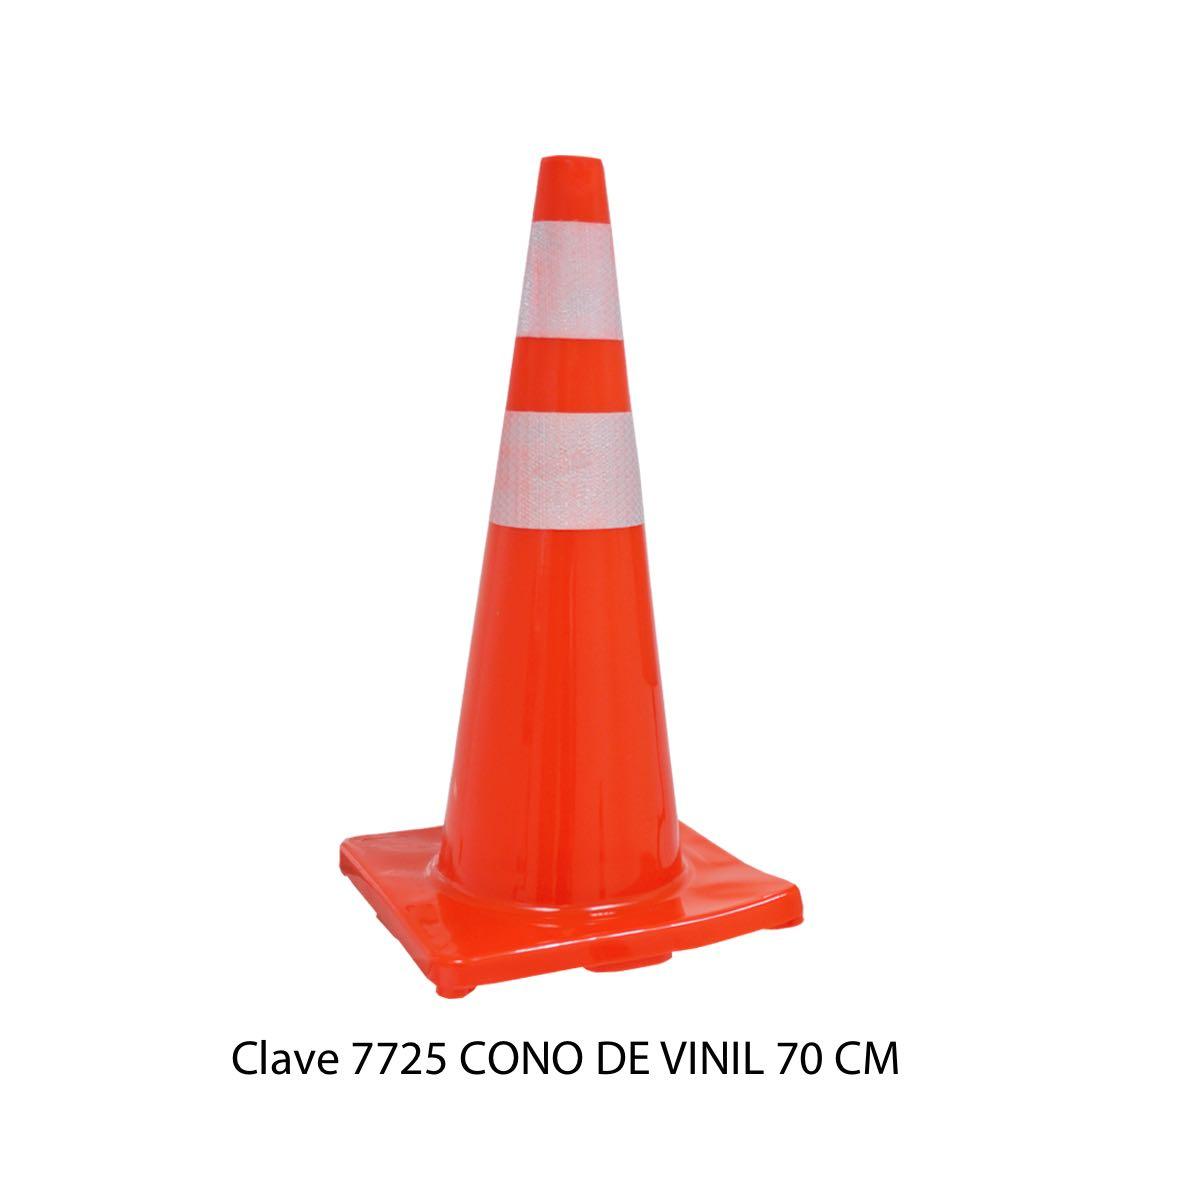 Cono de Vinil 70 cm Modelo 7725 - Sablón